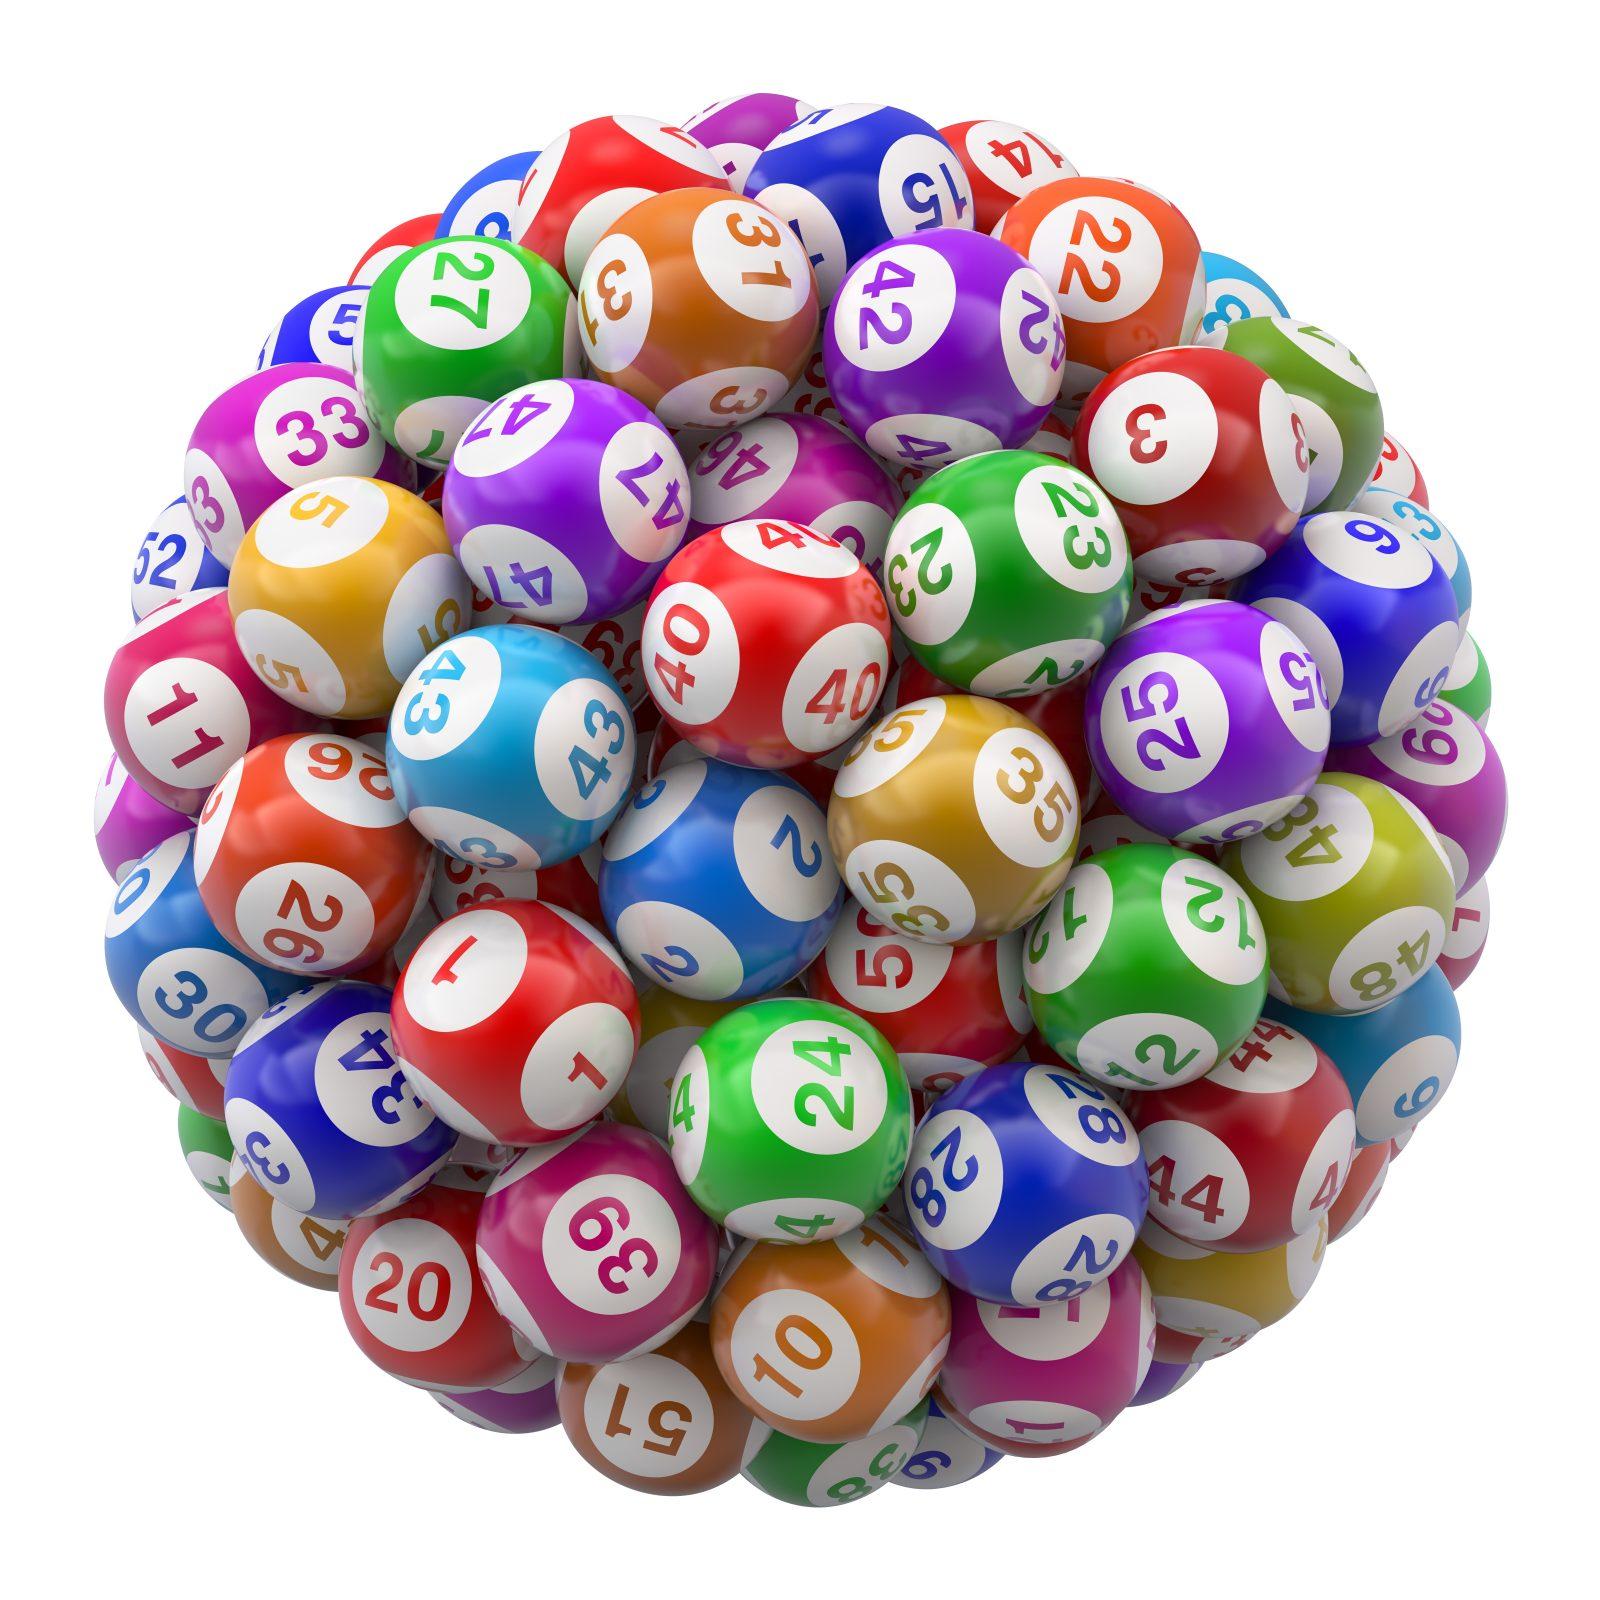 Lottery ball 365550023